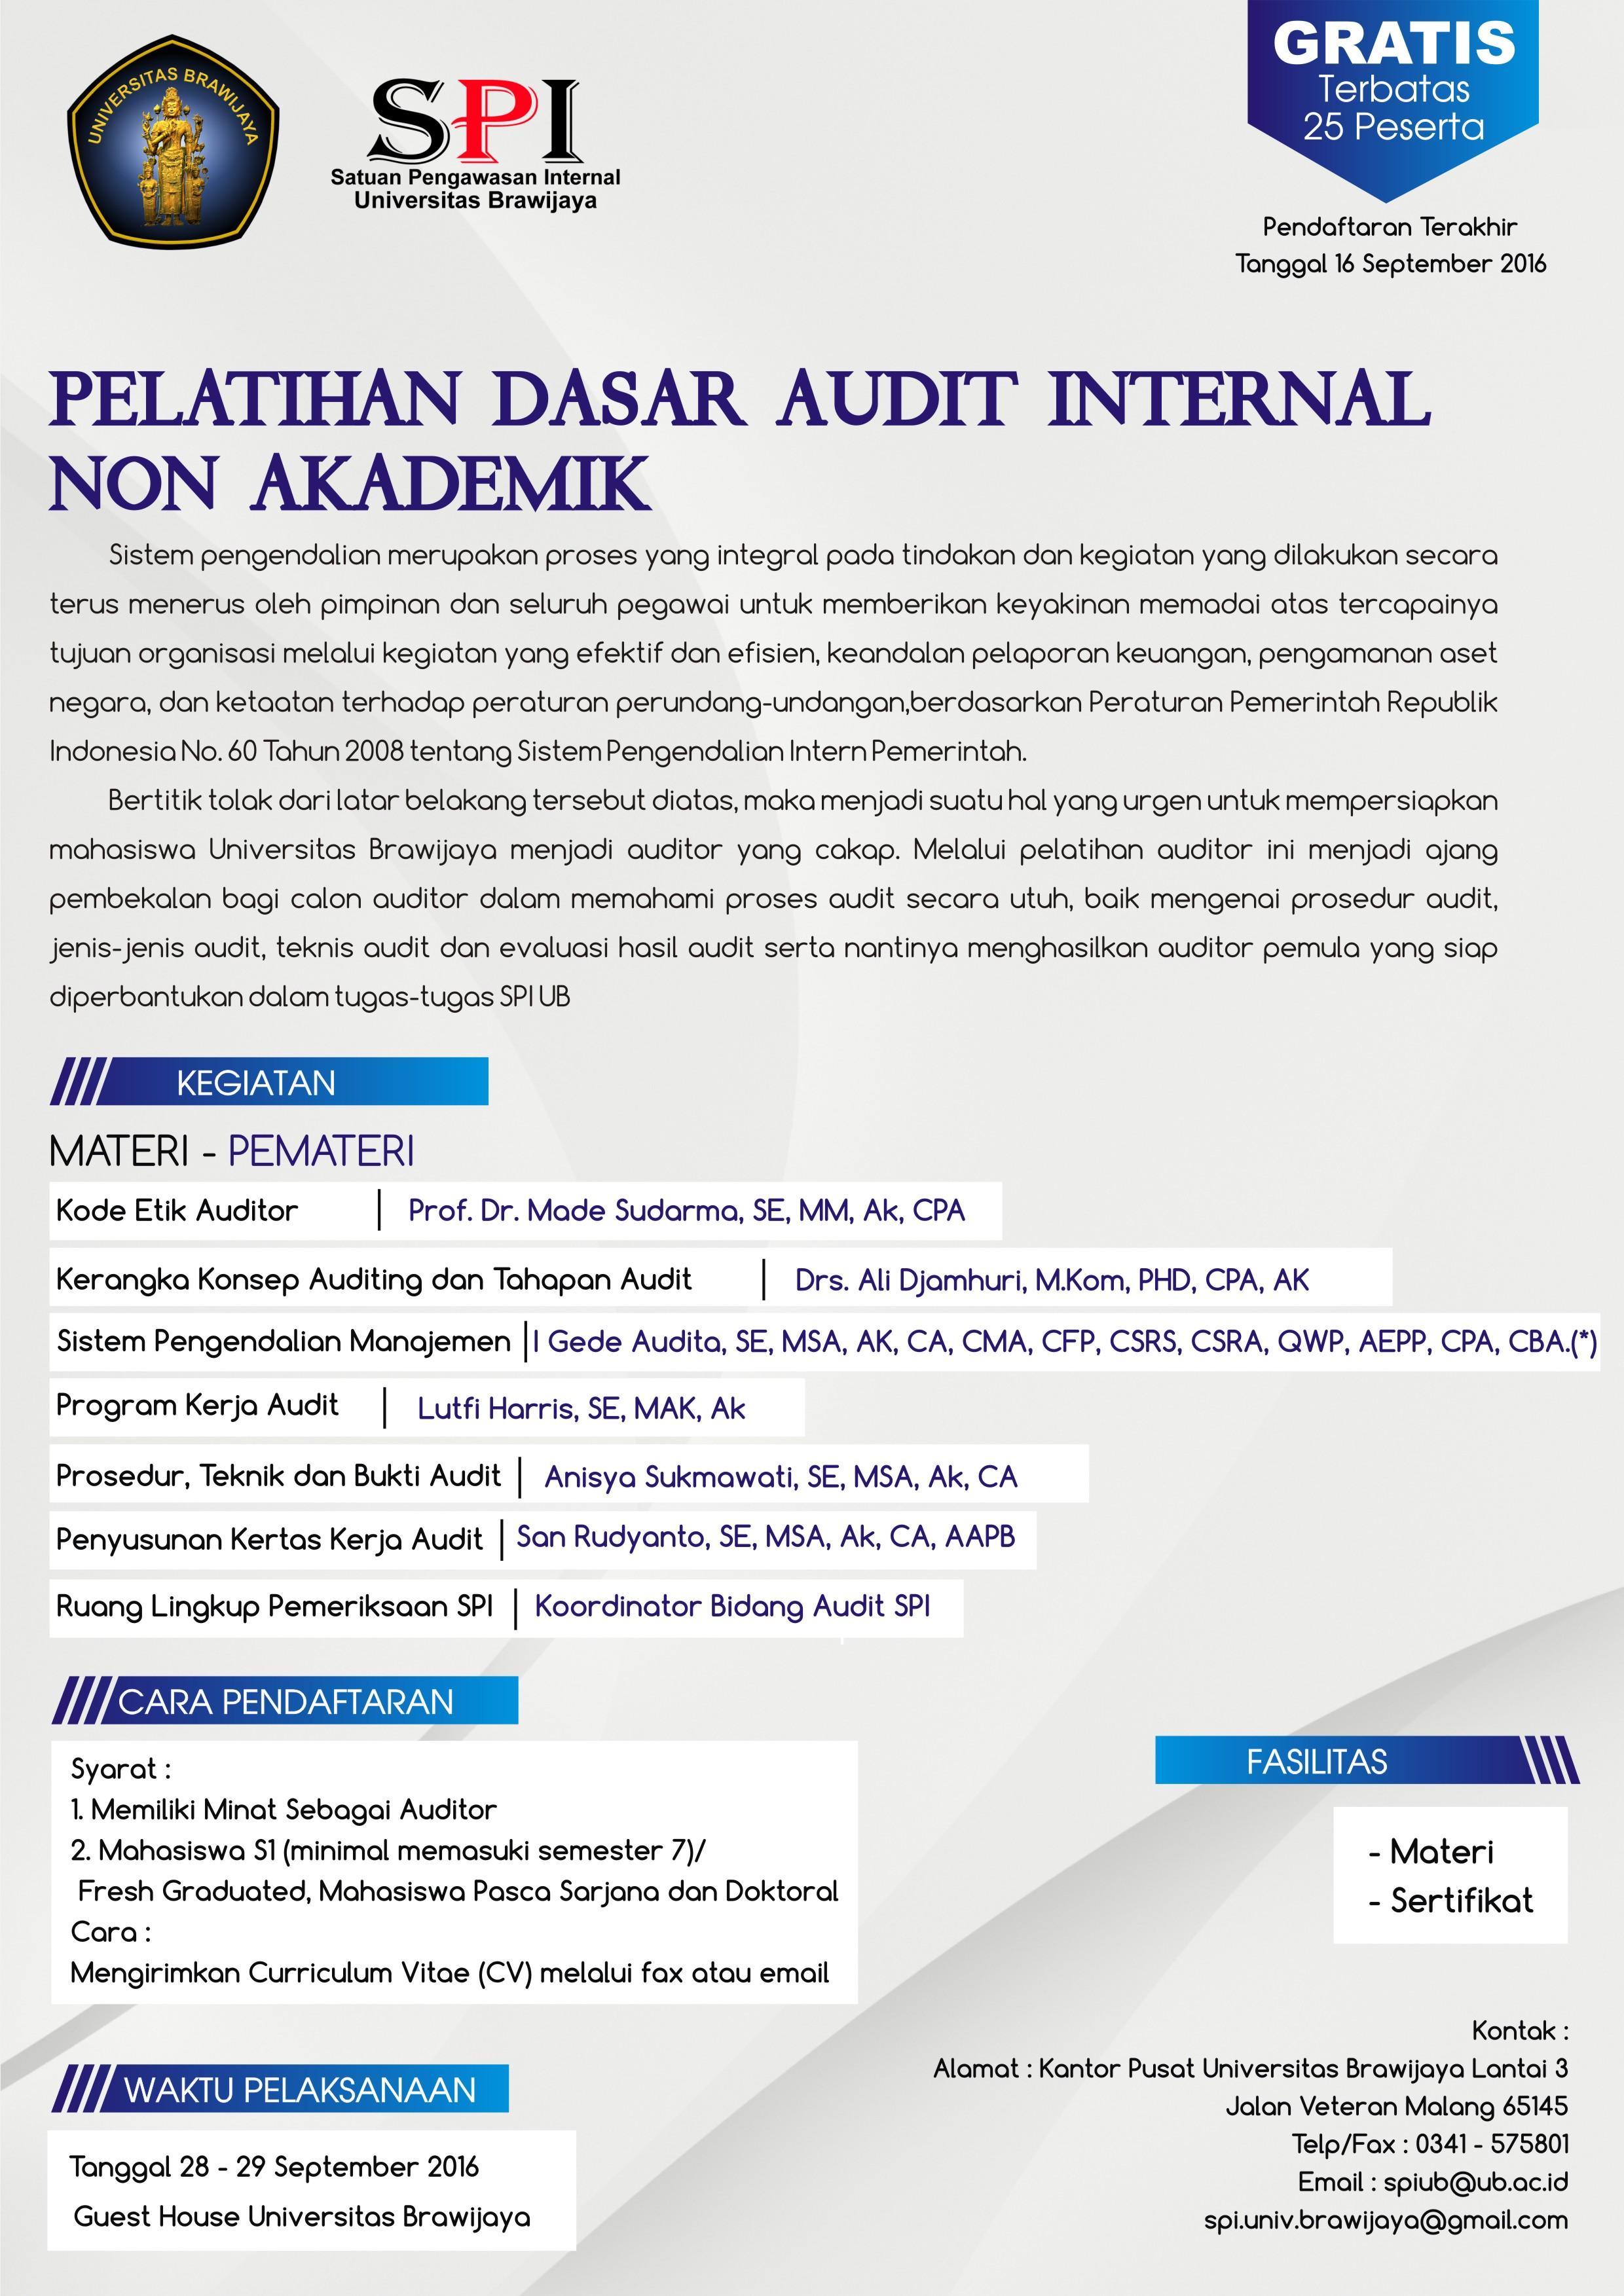 Pelatihan Dasar Audit(JPG)